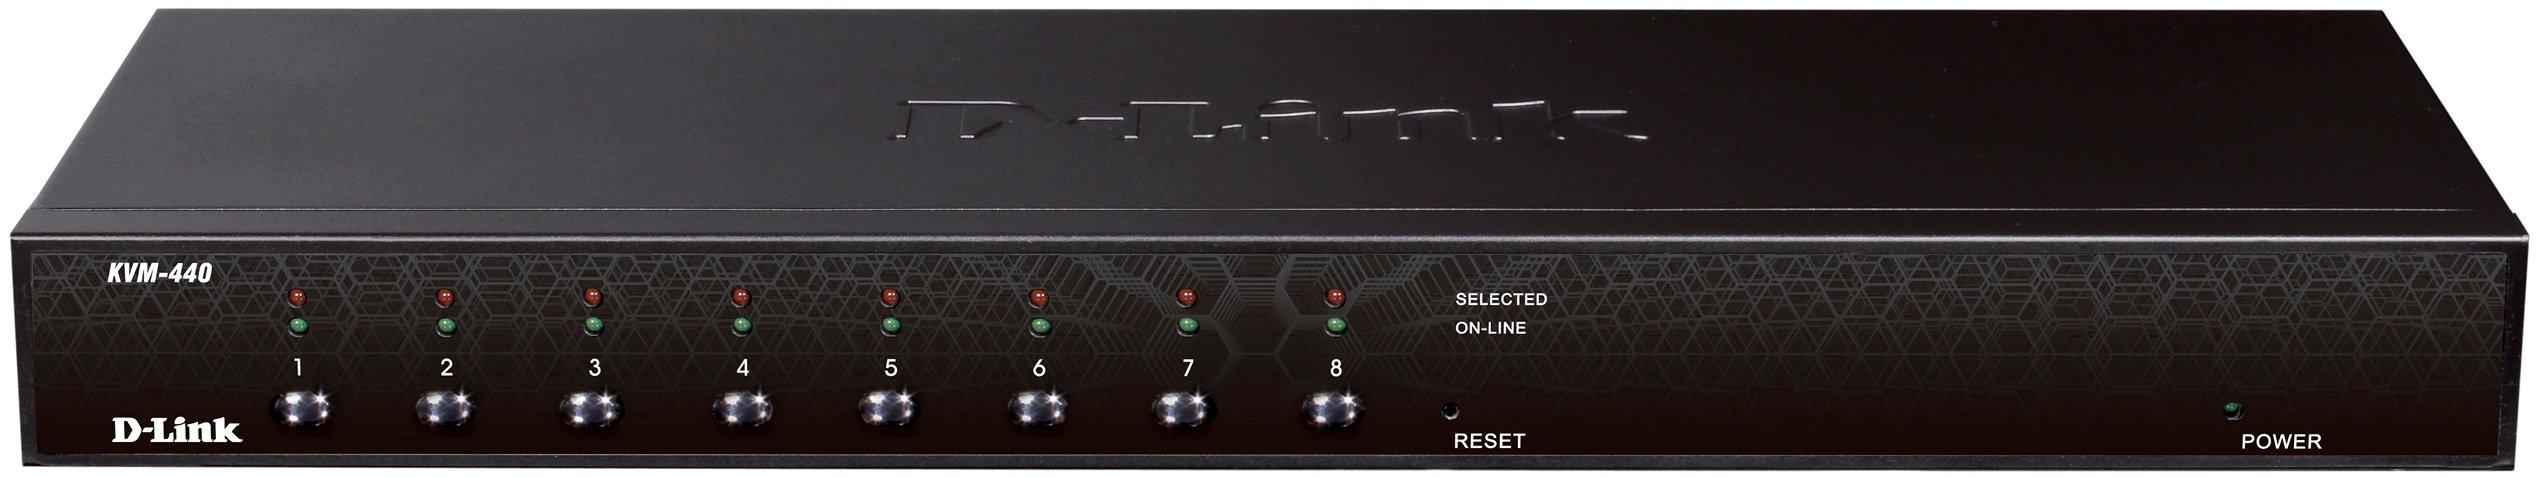 D-Link Systems, Inc. KVM-440 8-Port PS2/USB Combo KVM Switch